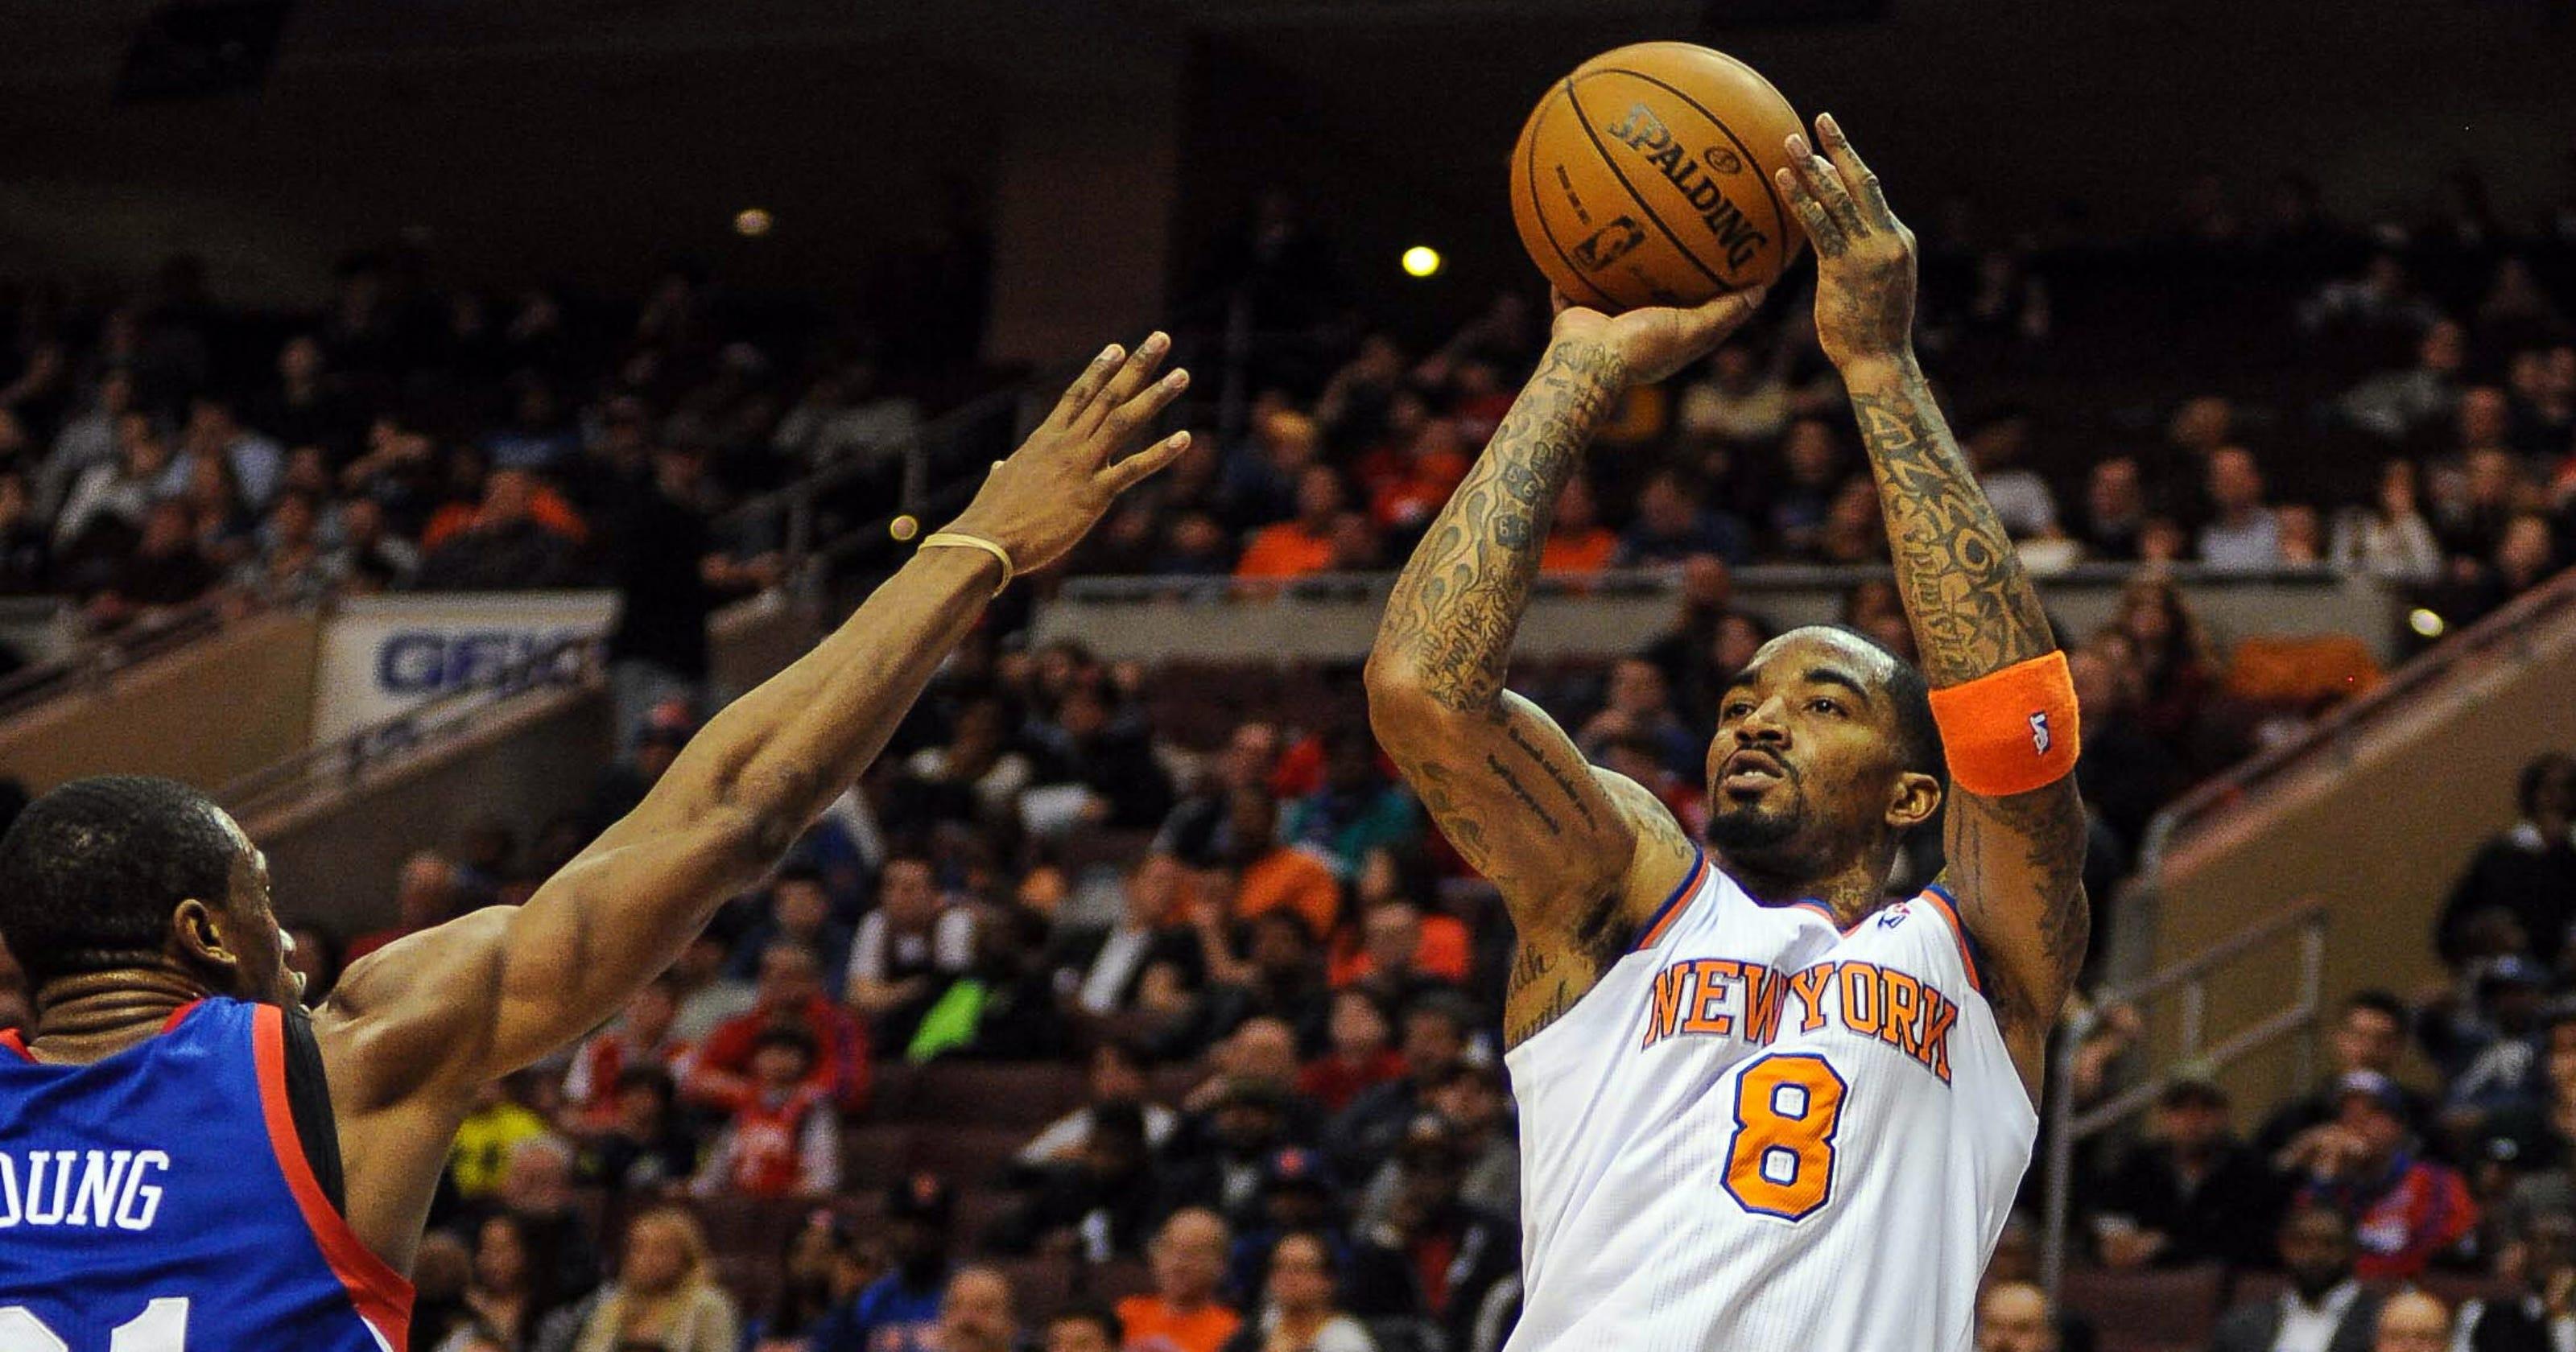 d7f9e3062 J.R. Smith returns to help Knicks top 76ers